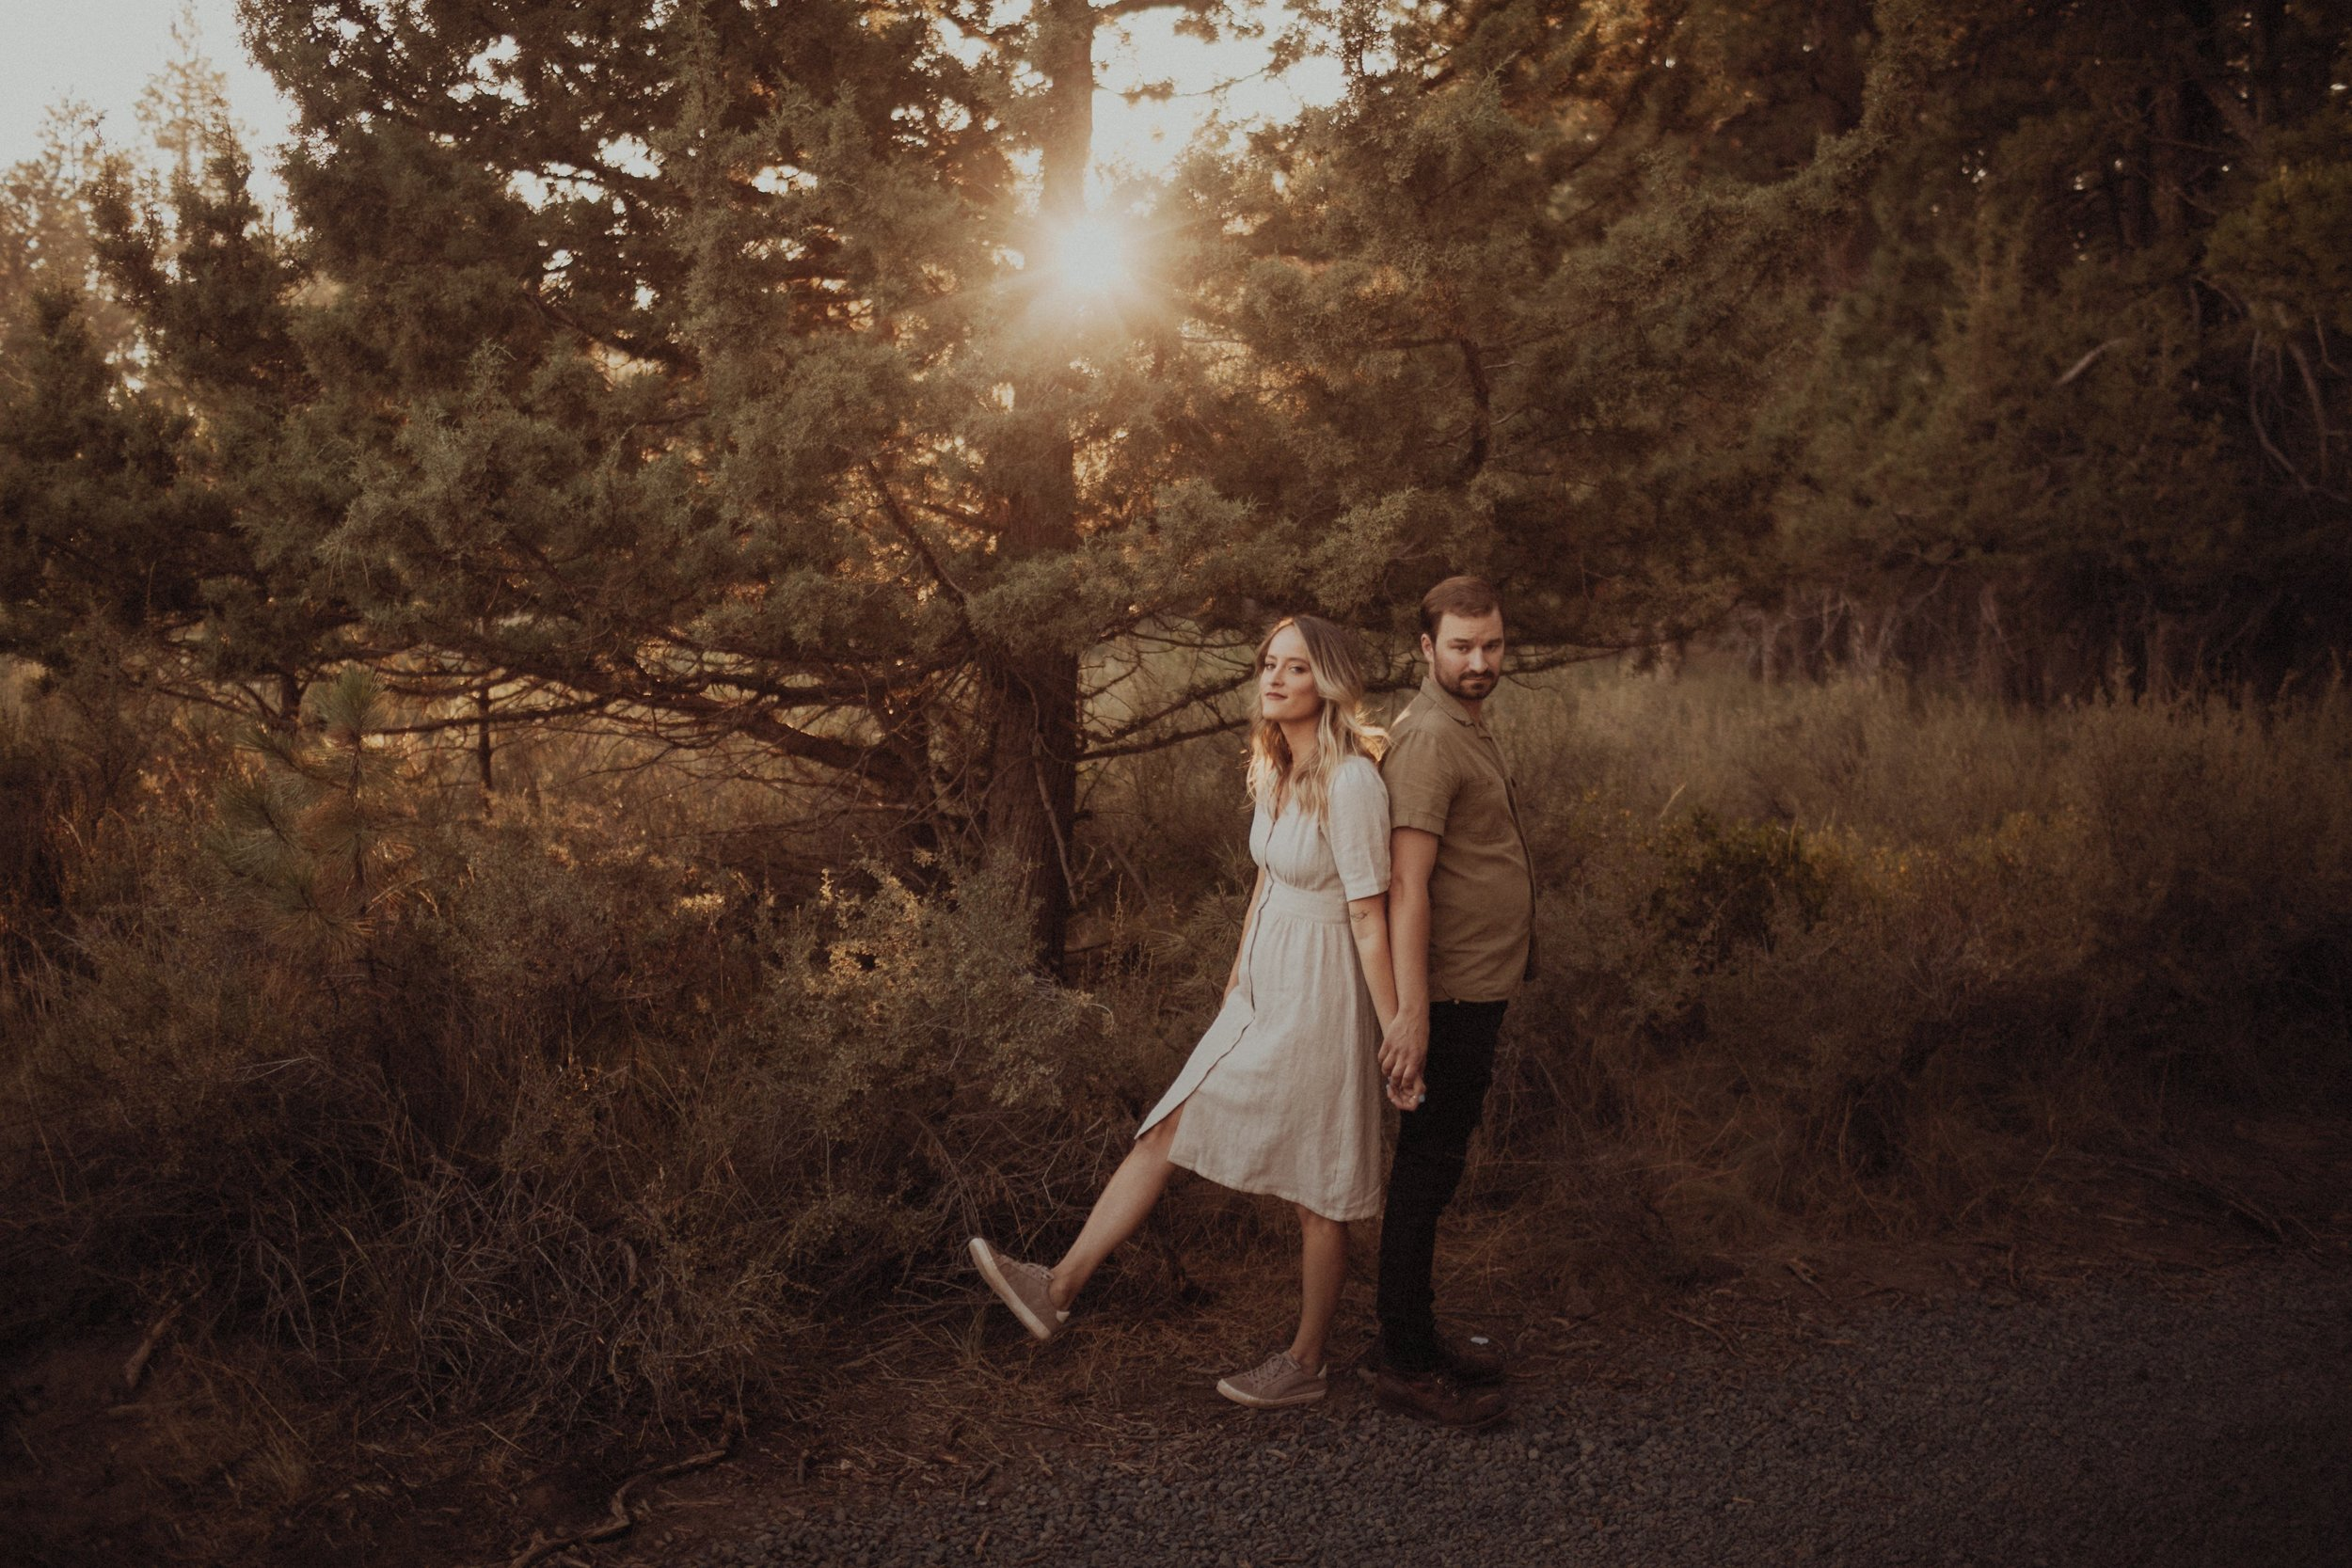 Dillon Falls Couple Shoot.Lauren Apel Photo30.JPG